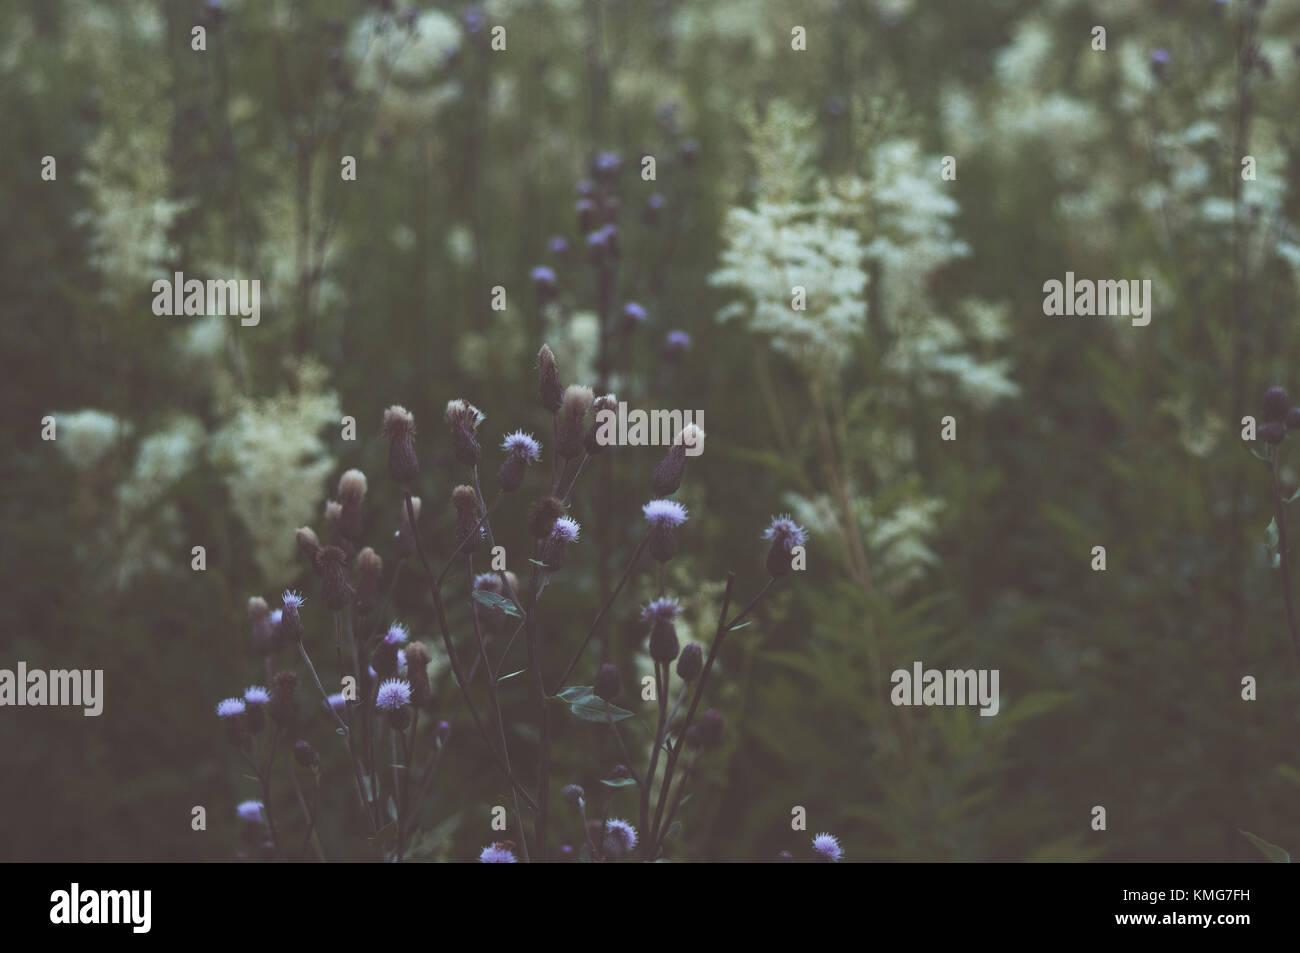 Vitntage flower photography. Fresh morning sense. - Stock Image